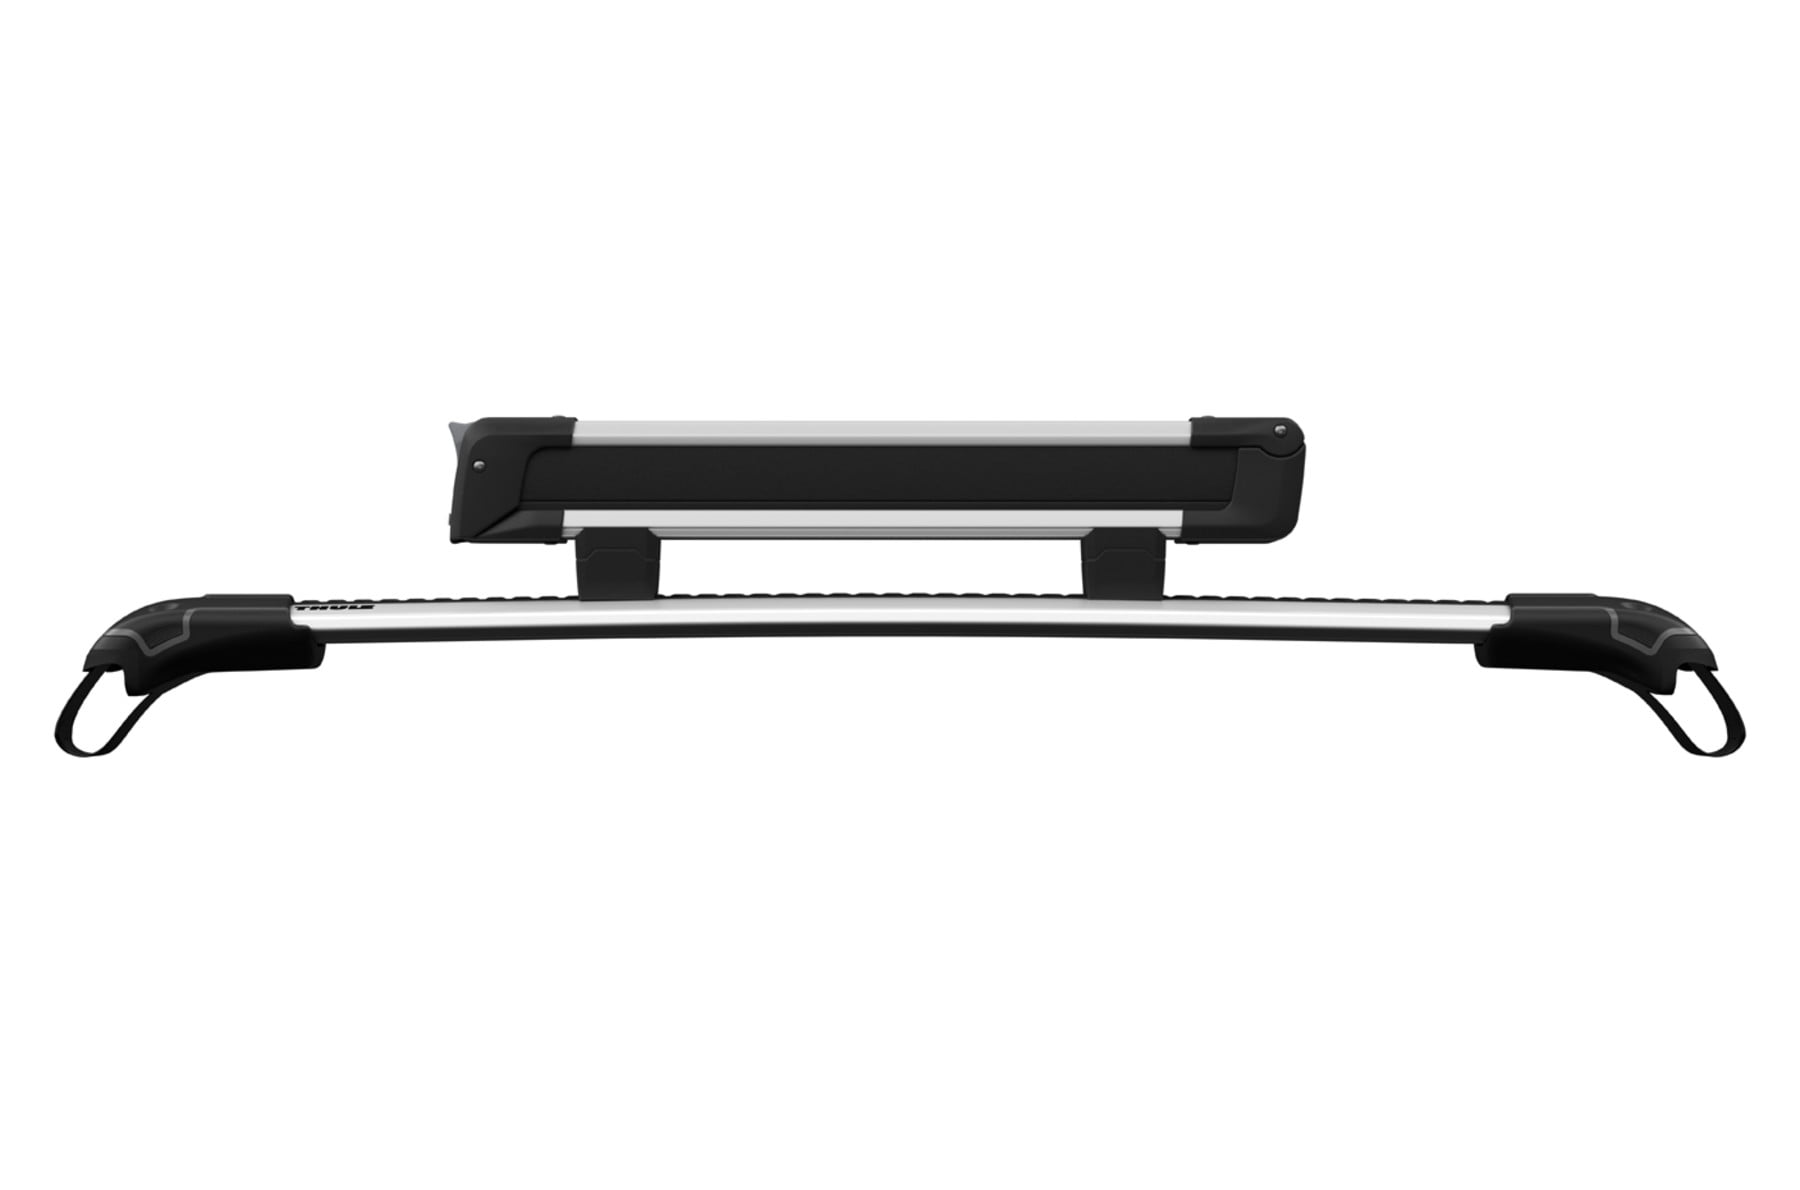 Suport schiuri Thule SnowPack 7324 cu prindere pe bare transversale din aluminiu cu profil T 5